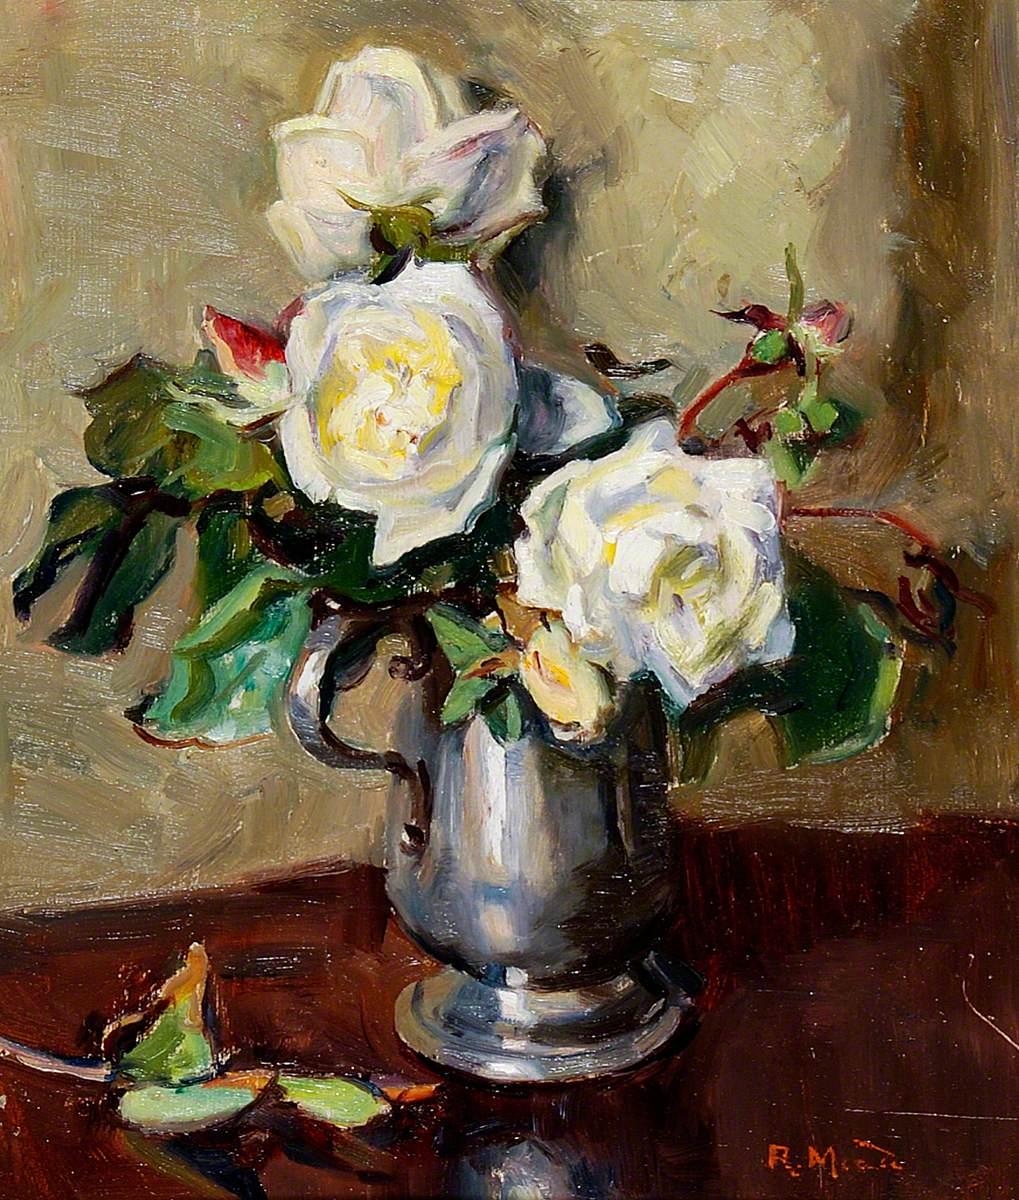 White Roses in a Pewter Mug